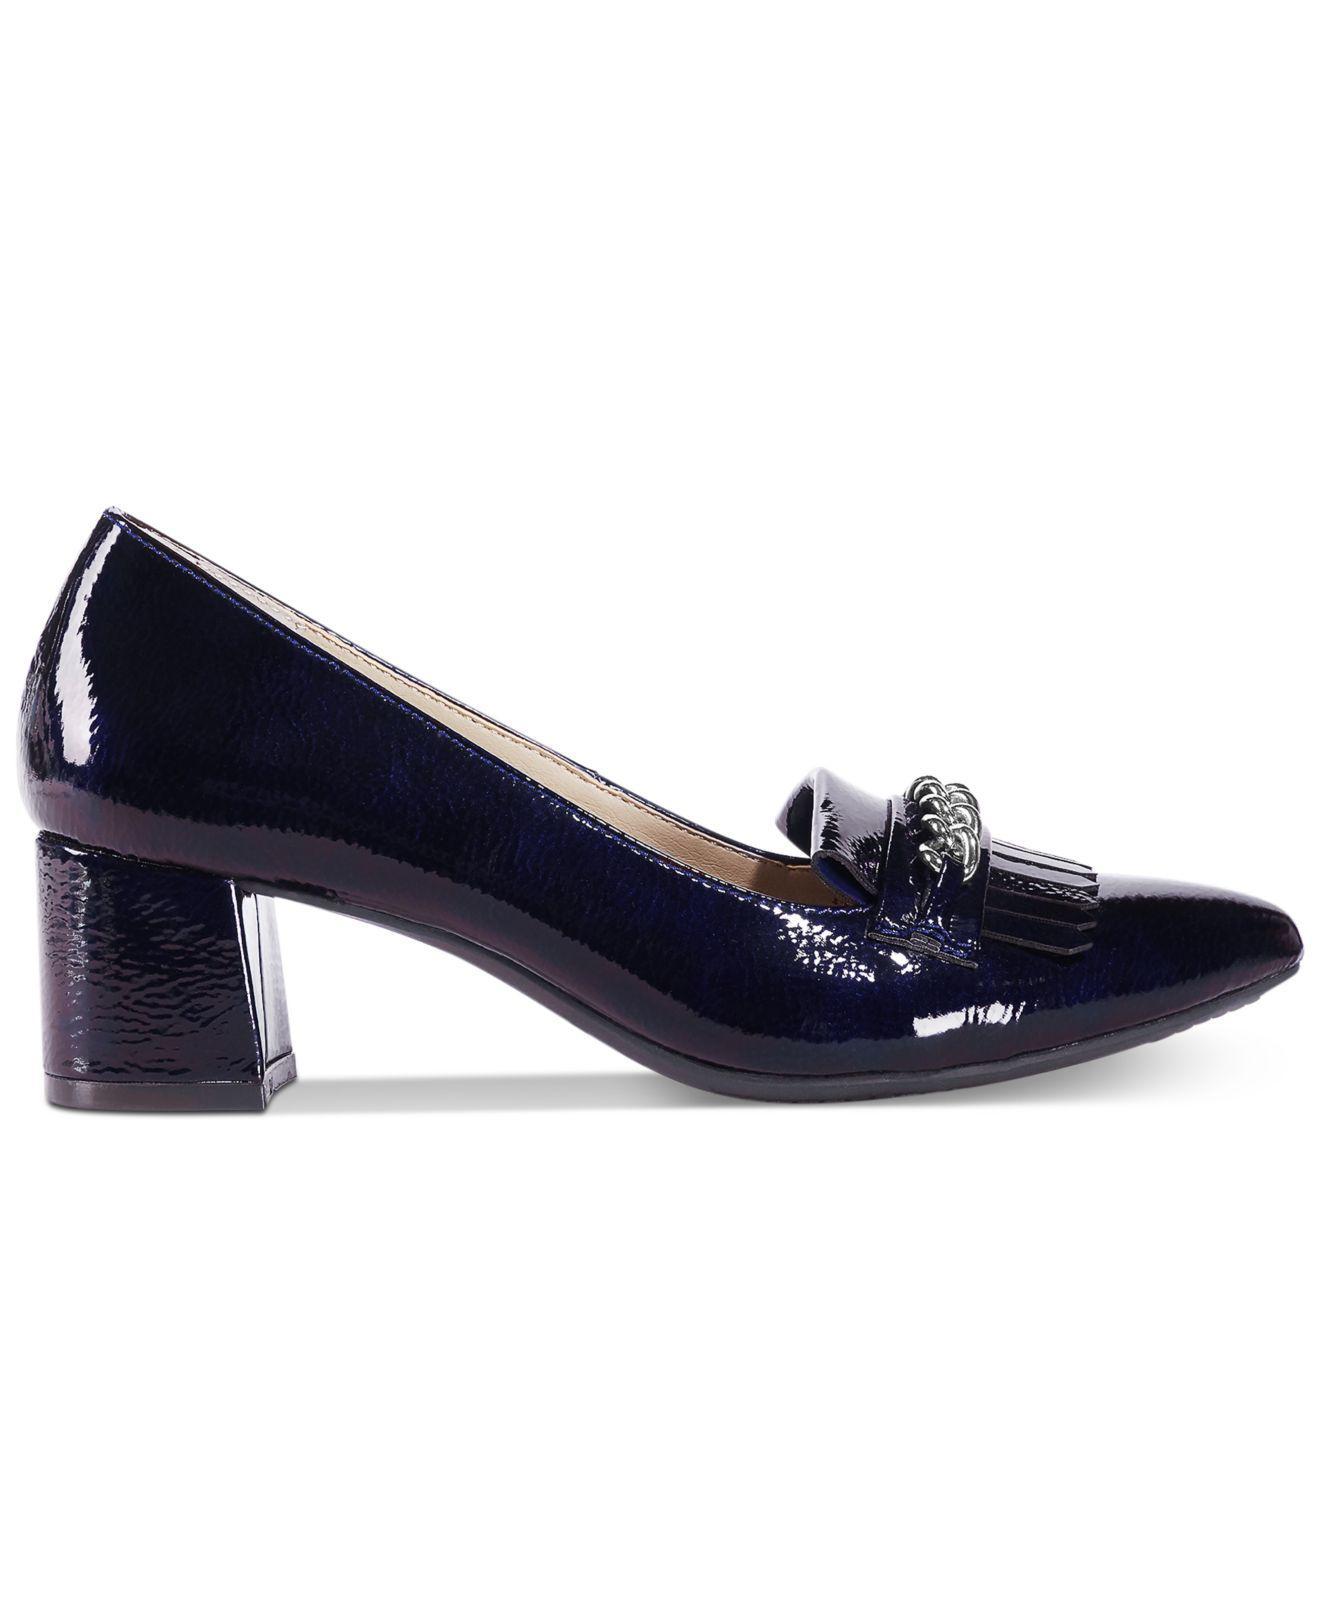 336dadaa88b Lyst - Rialto Marshall Block-heel Dress Pumps in Blue